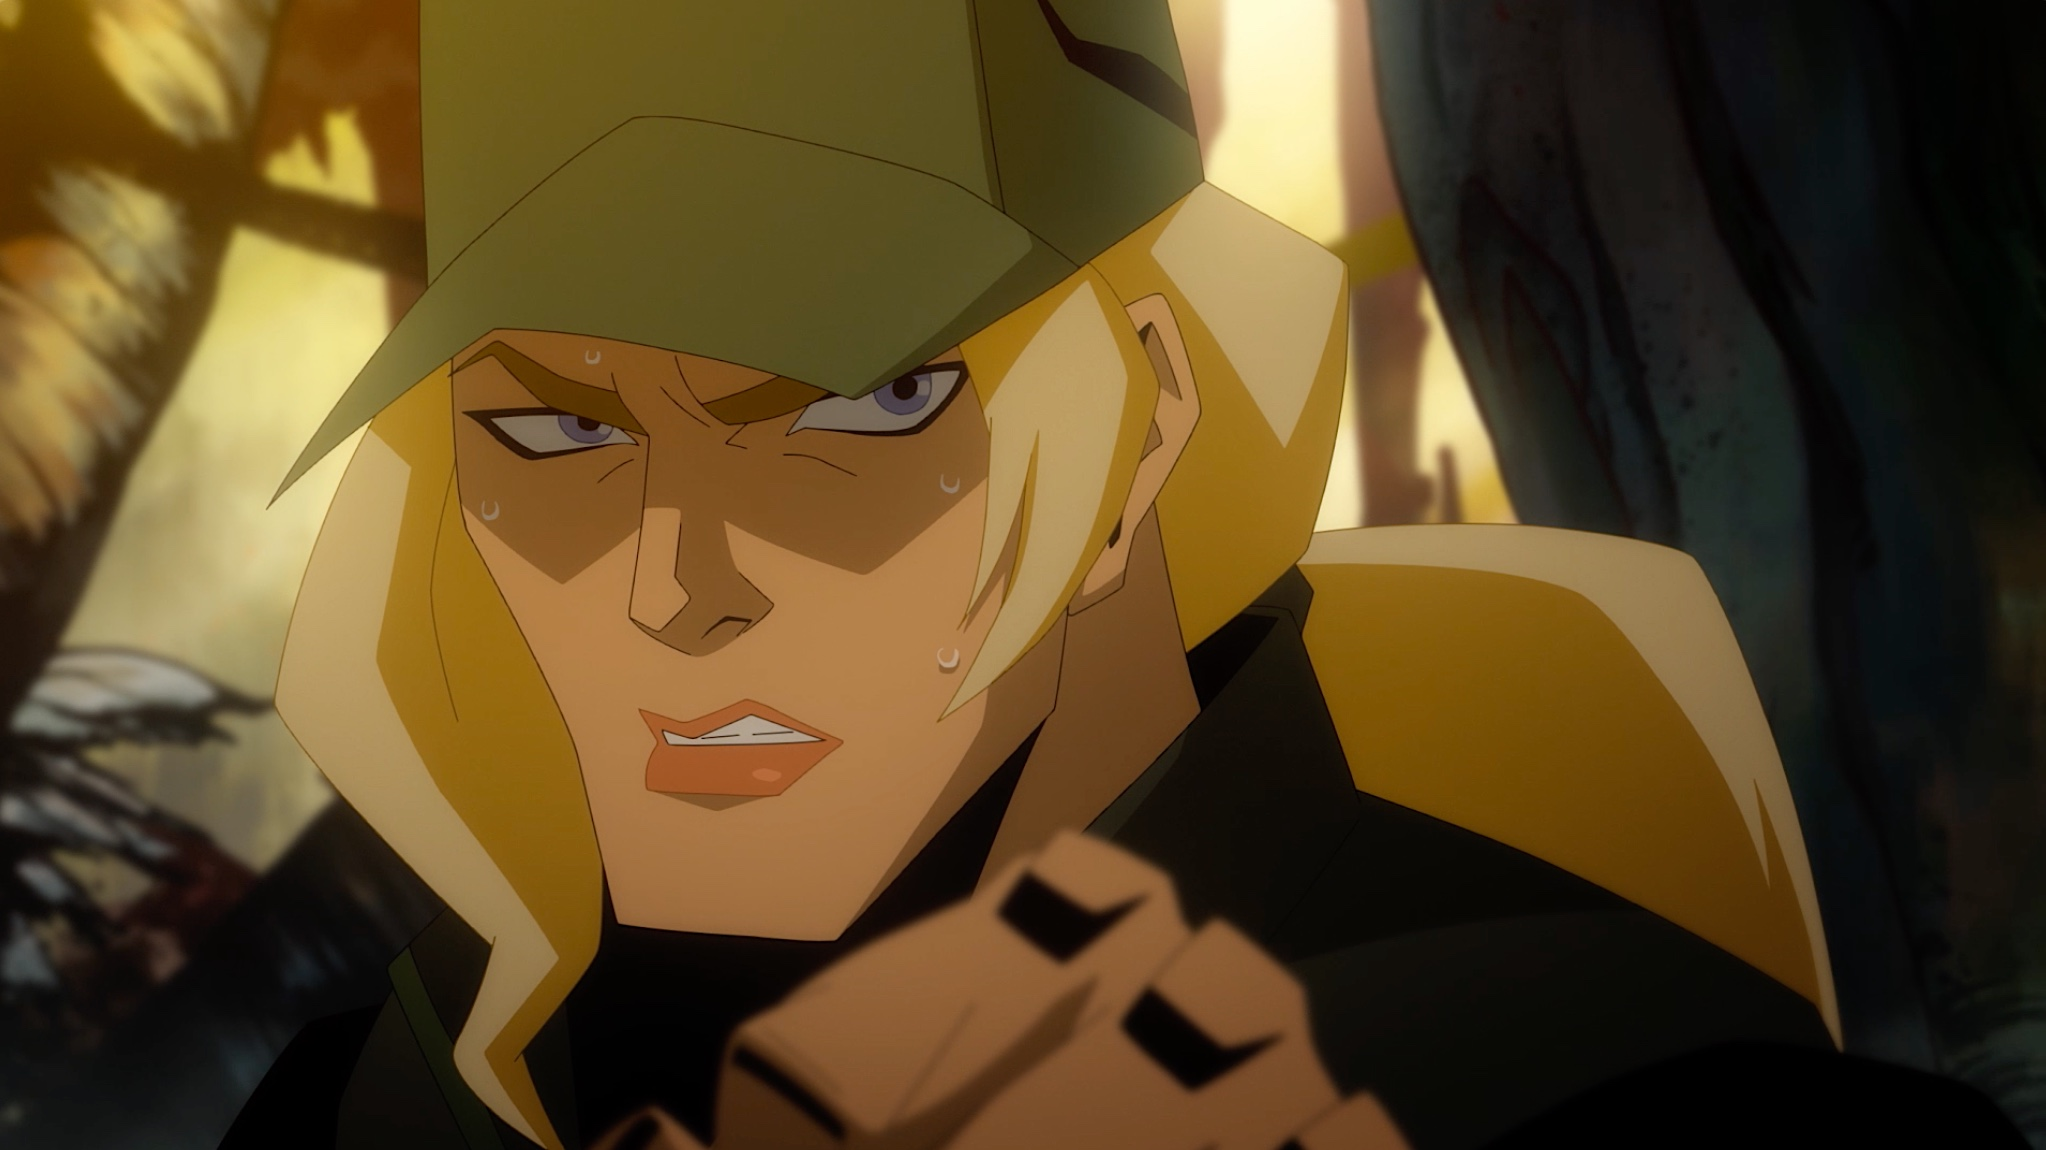 Action Figure Insider Sonya Blade In Action New Clip From Mortal Kombat Legends Scorpion S Revenge